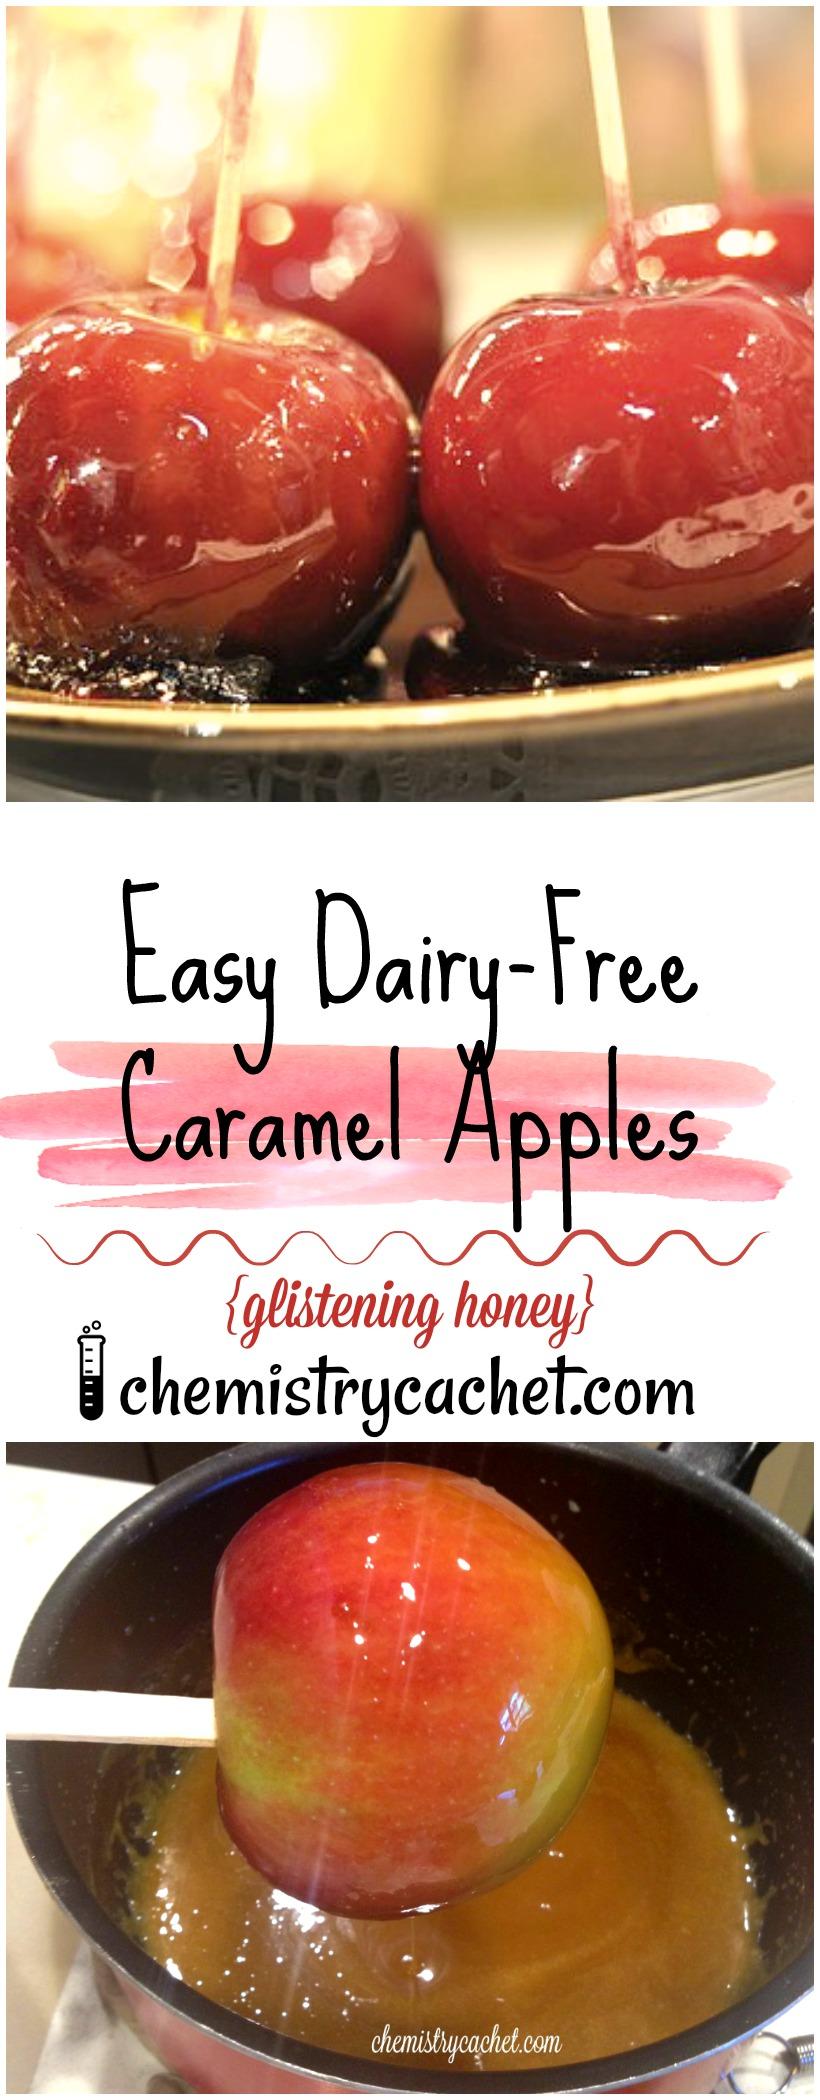 Easy Dairy-Free Caramel Apples. Glistening honey, so delicious! on chemistrycachet.com